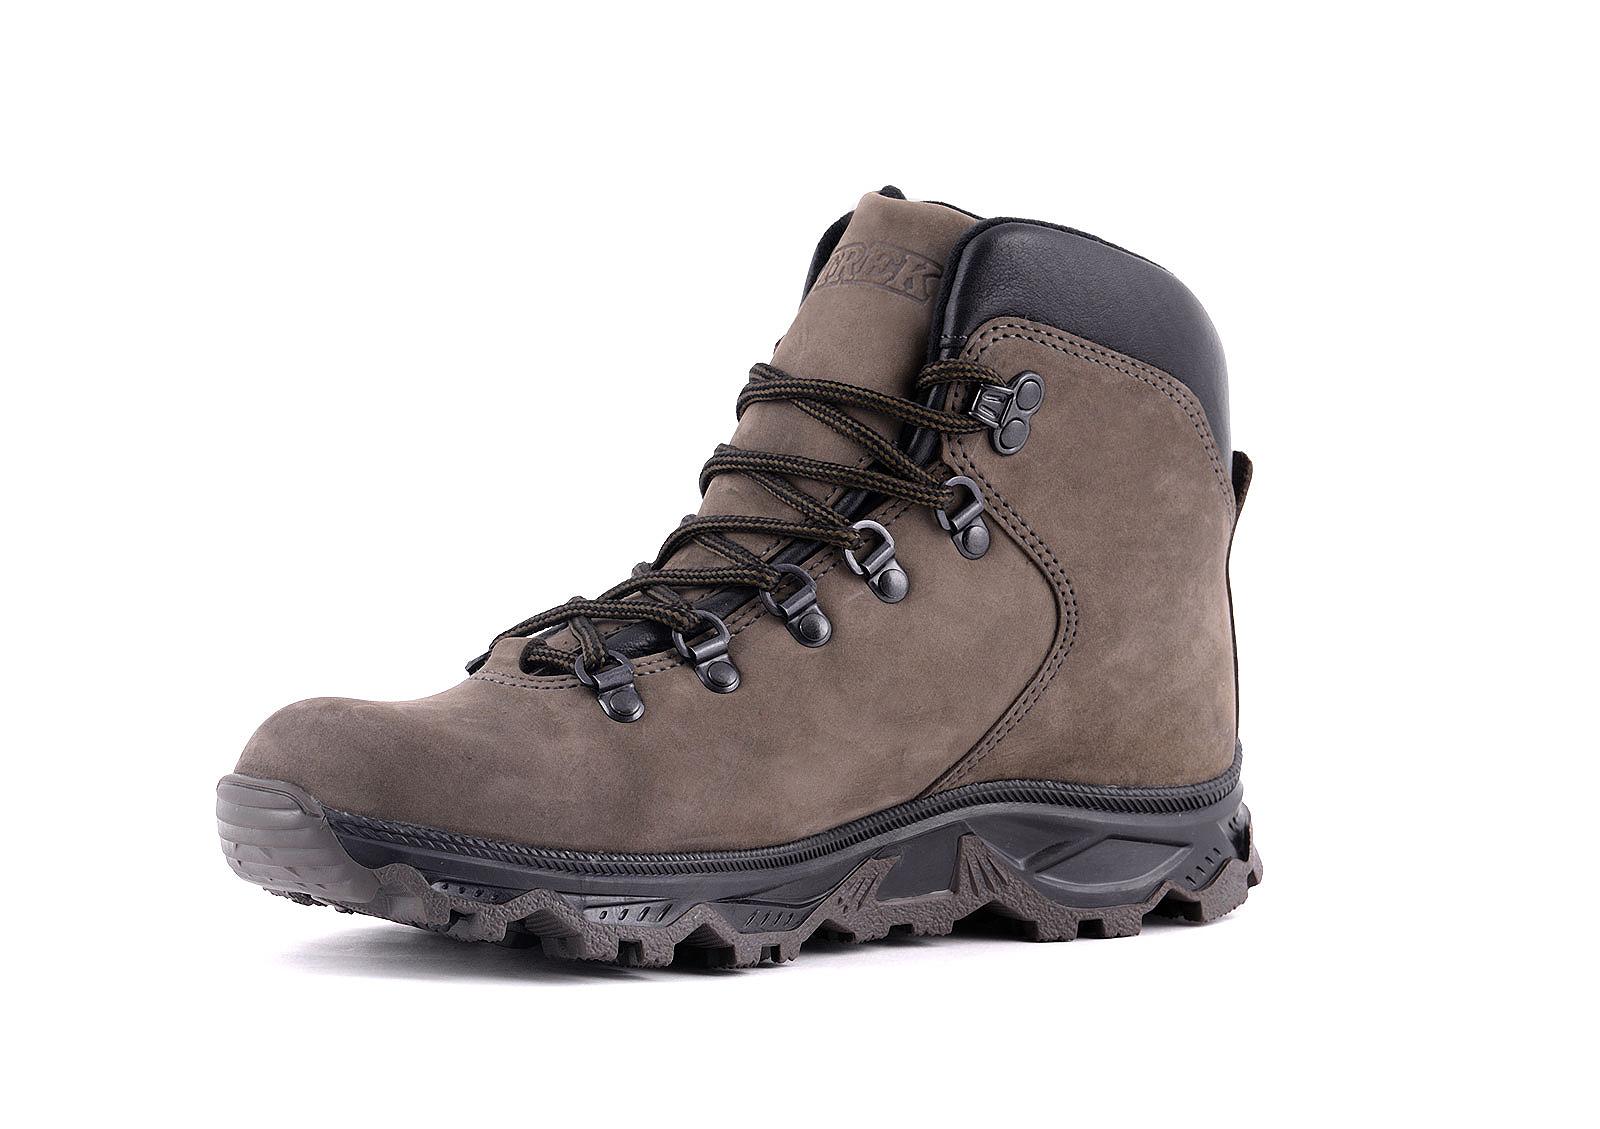 Ботинки мужские TREK Hiking7 (капровелюр), Ботинки - арт. 1129450177